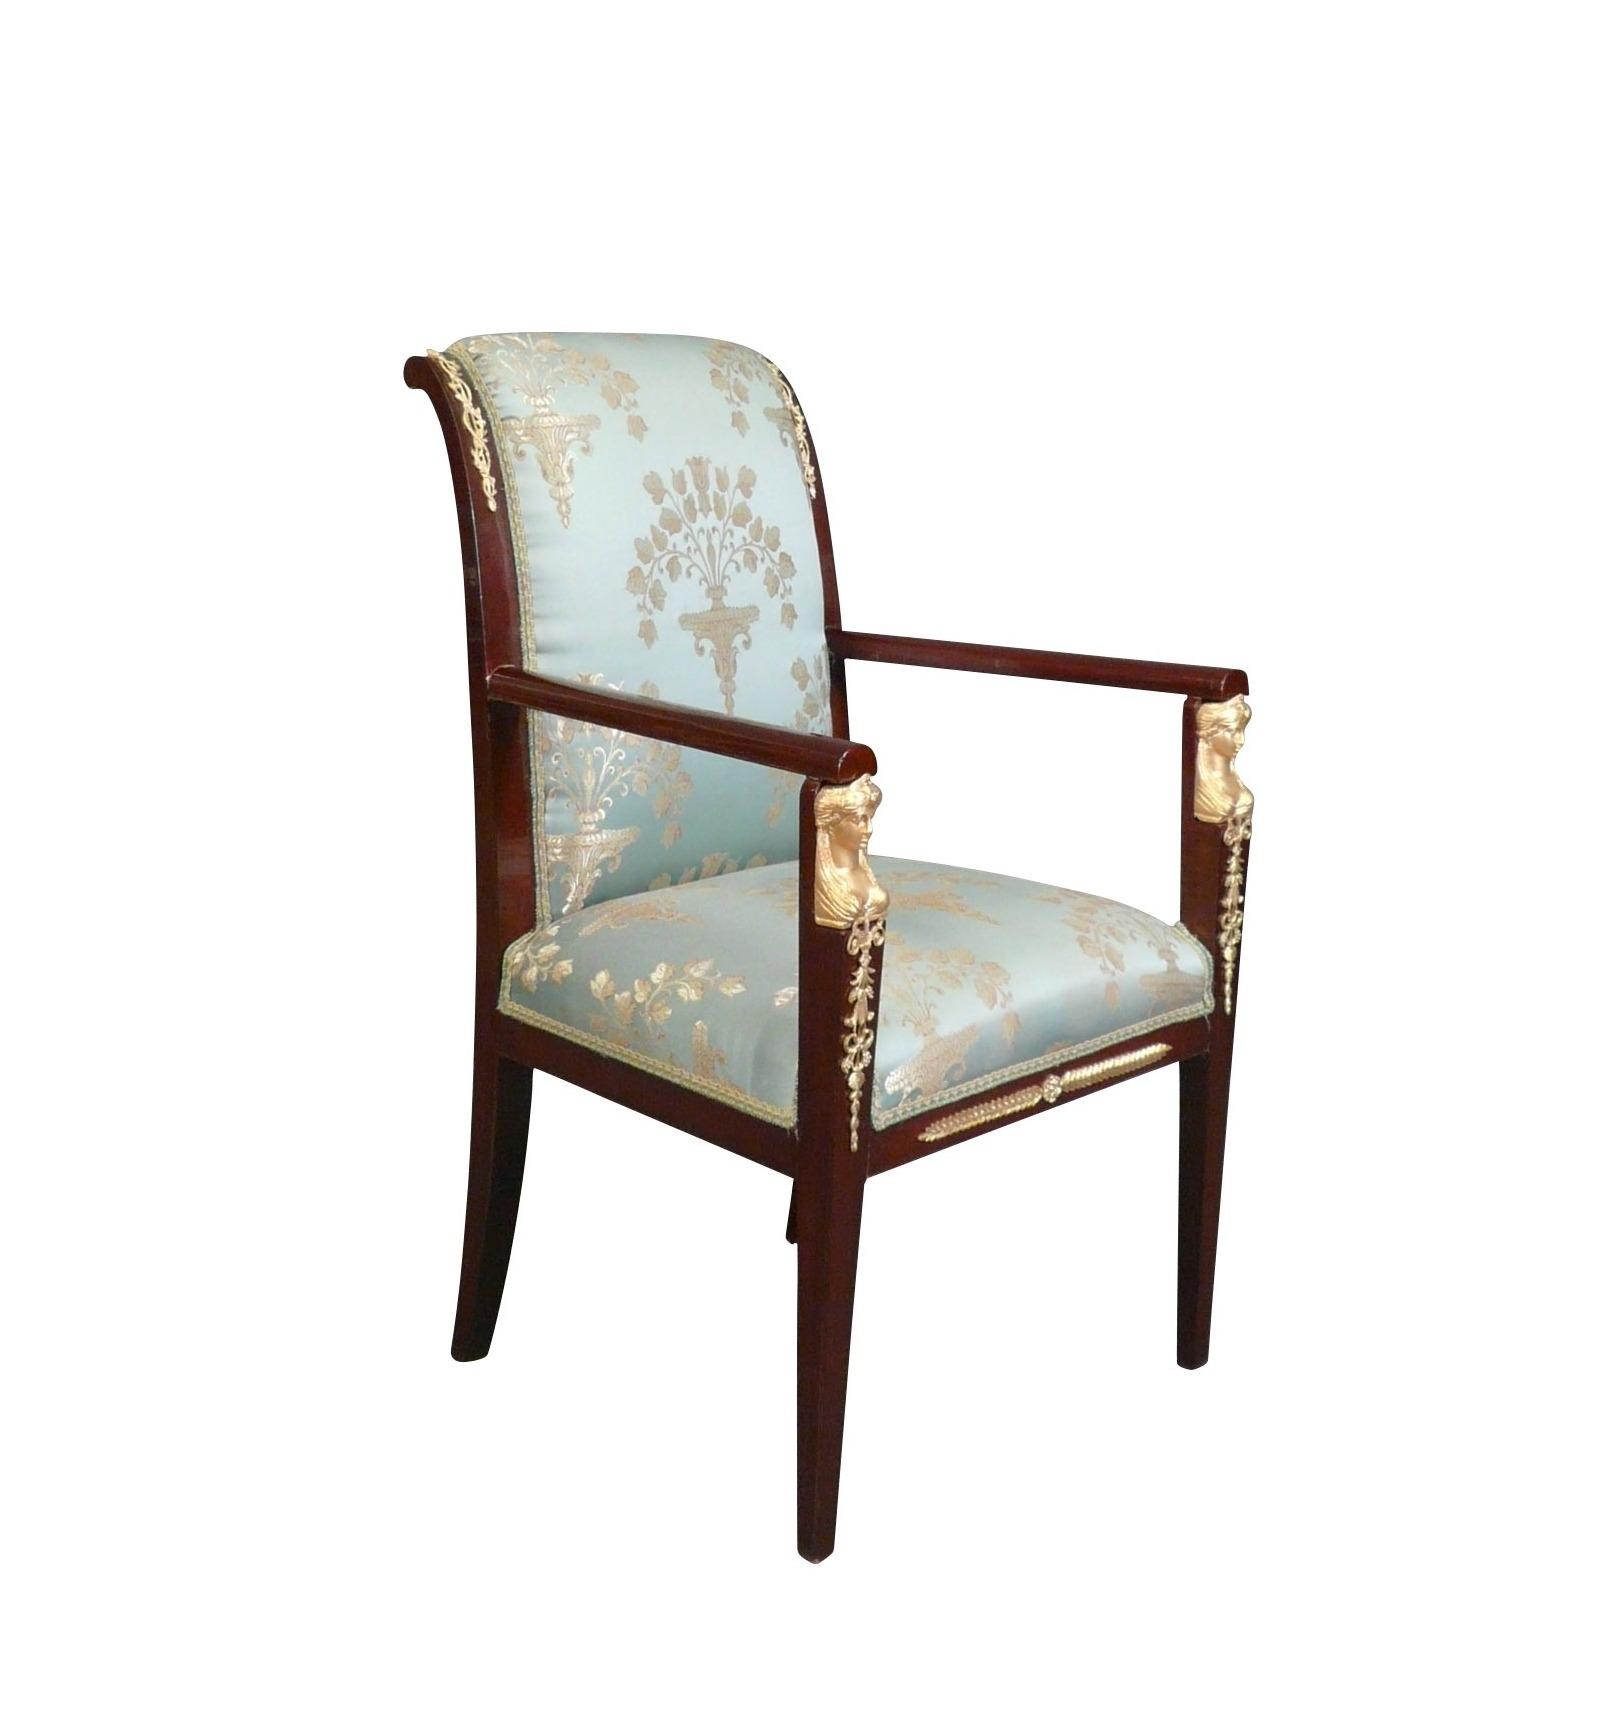 Fauteuil empire rev tu d 39 un tissu satin mobilier de style - Mobilier style empire ...